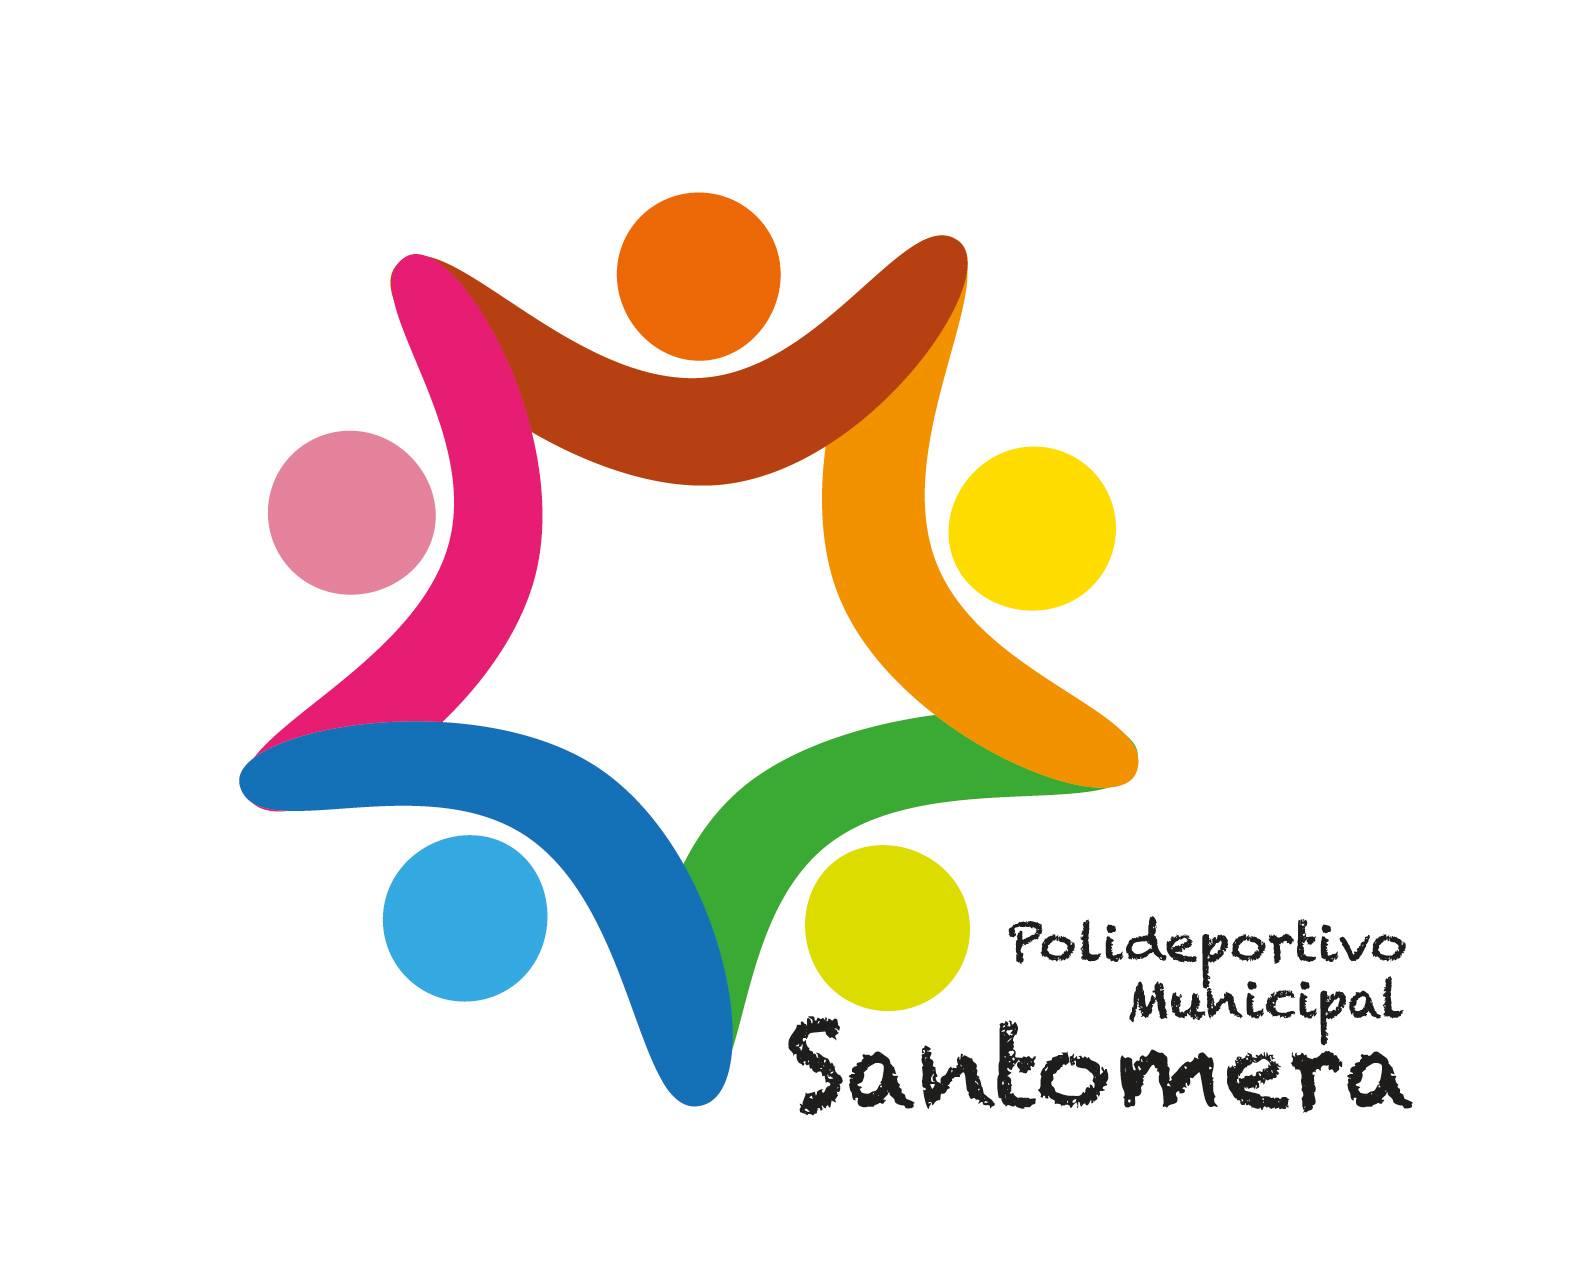 Polideportivo Municipal de Santomera